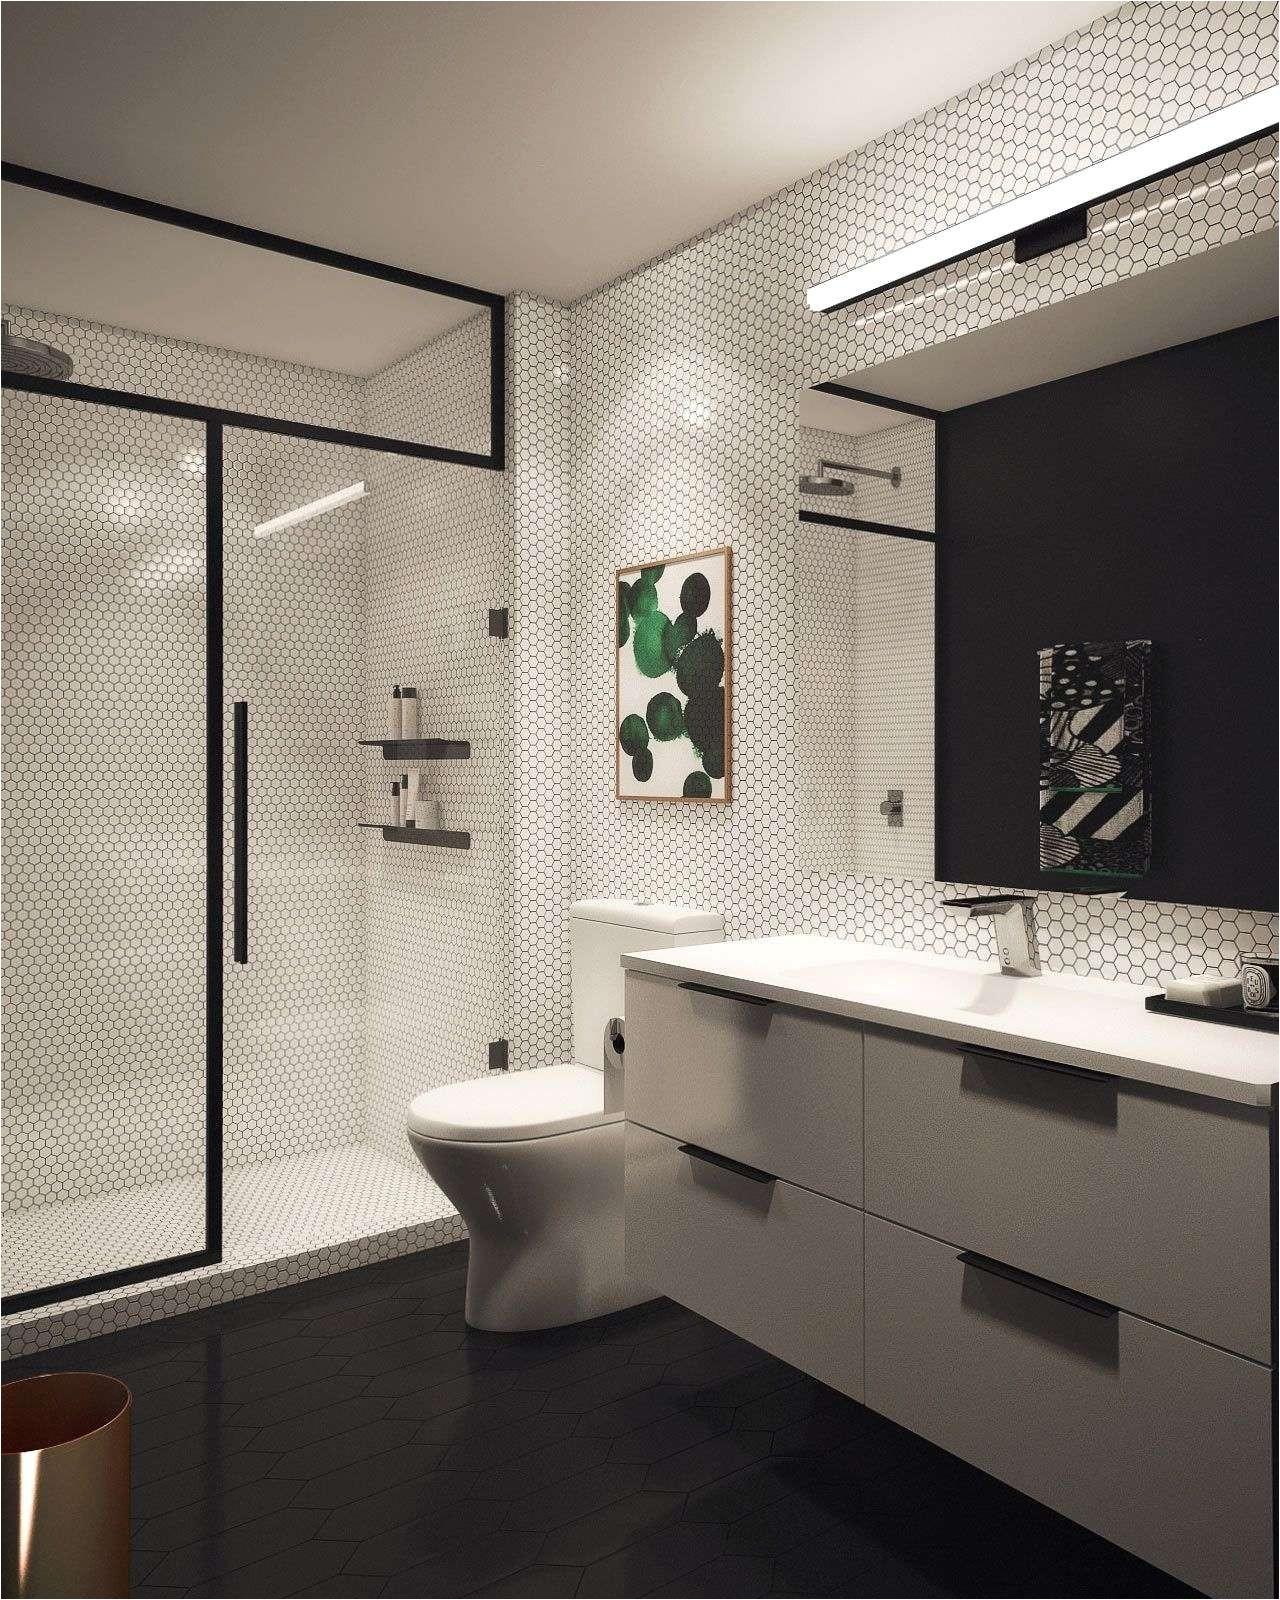 Small Bathroom Design Ideas Bathroom Design Ideas for Small Bathrooms Valid Lovely Small